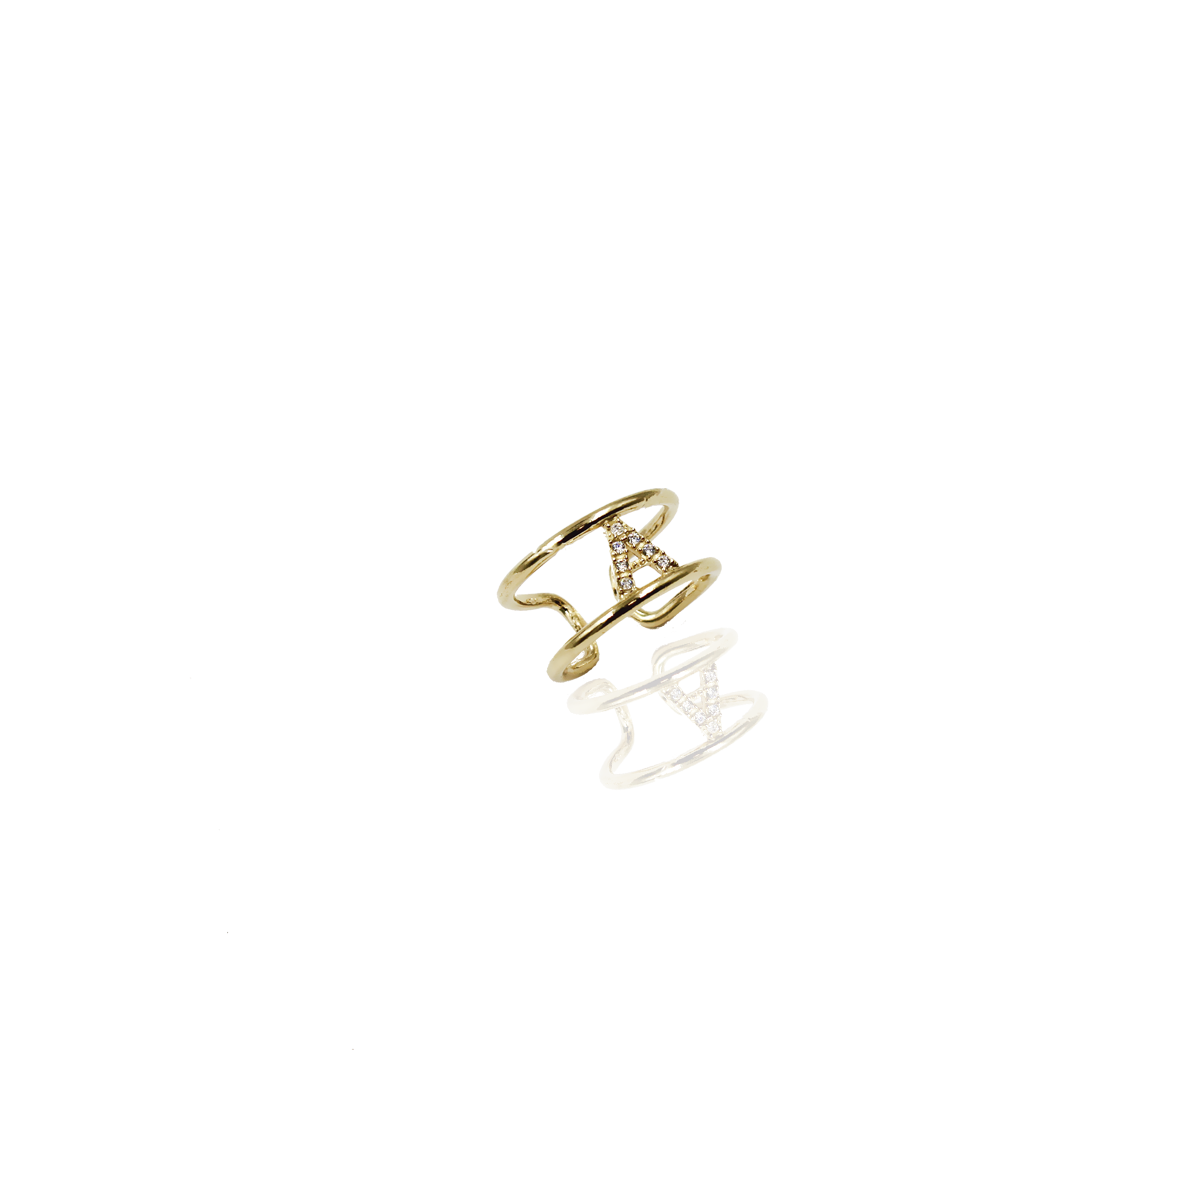 Anel Monograma Wof Prata Dourada 925 c/ Zircónias